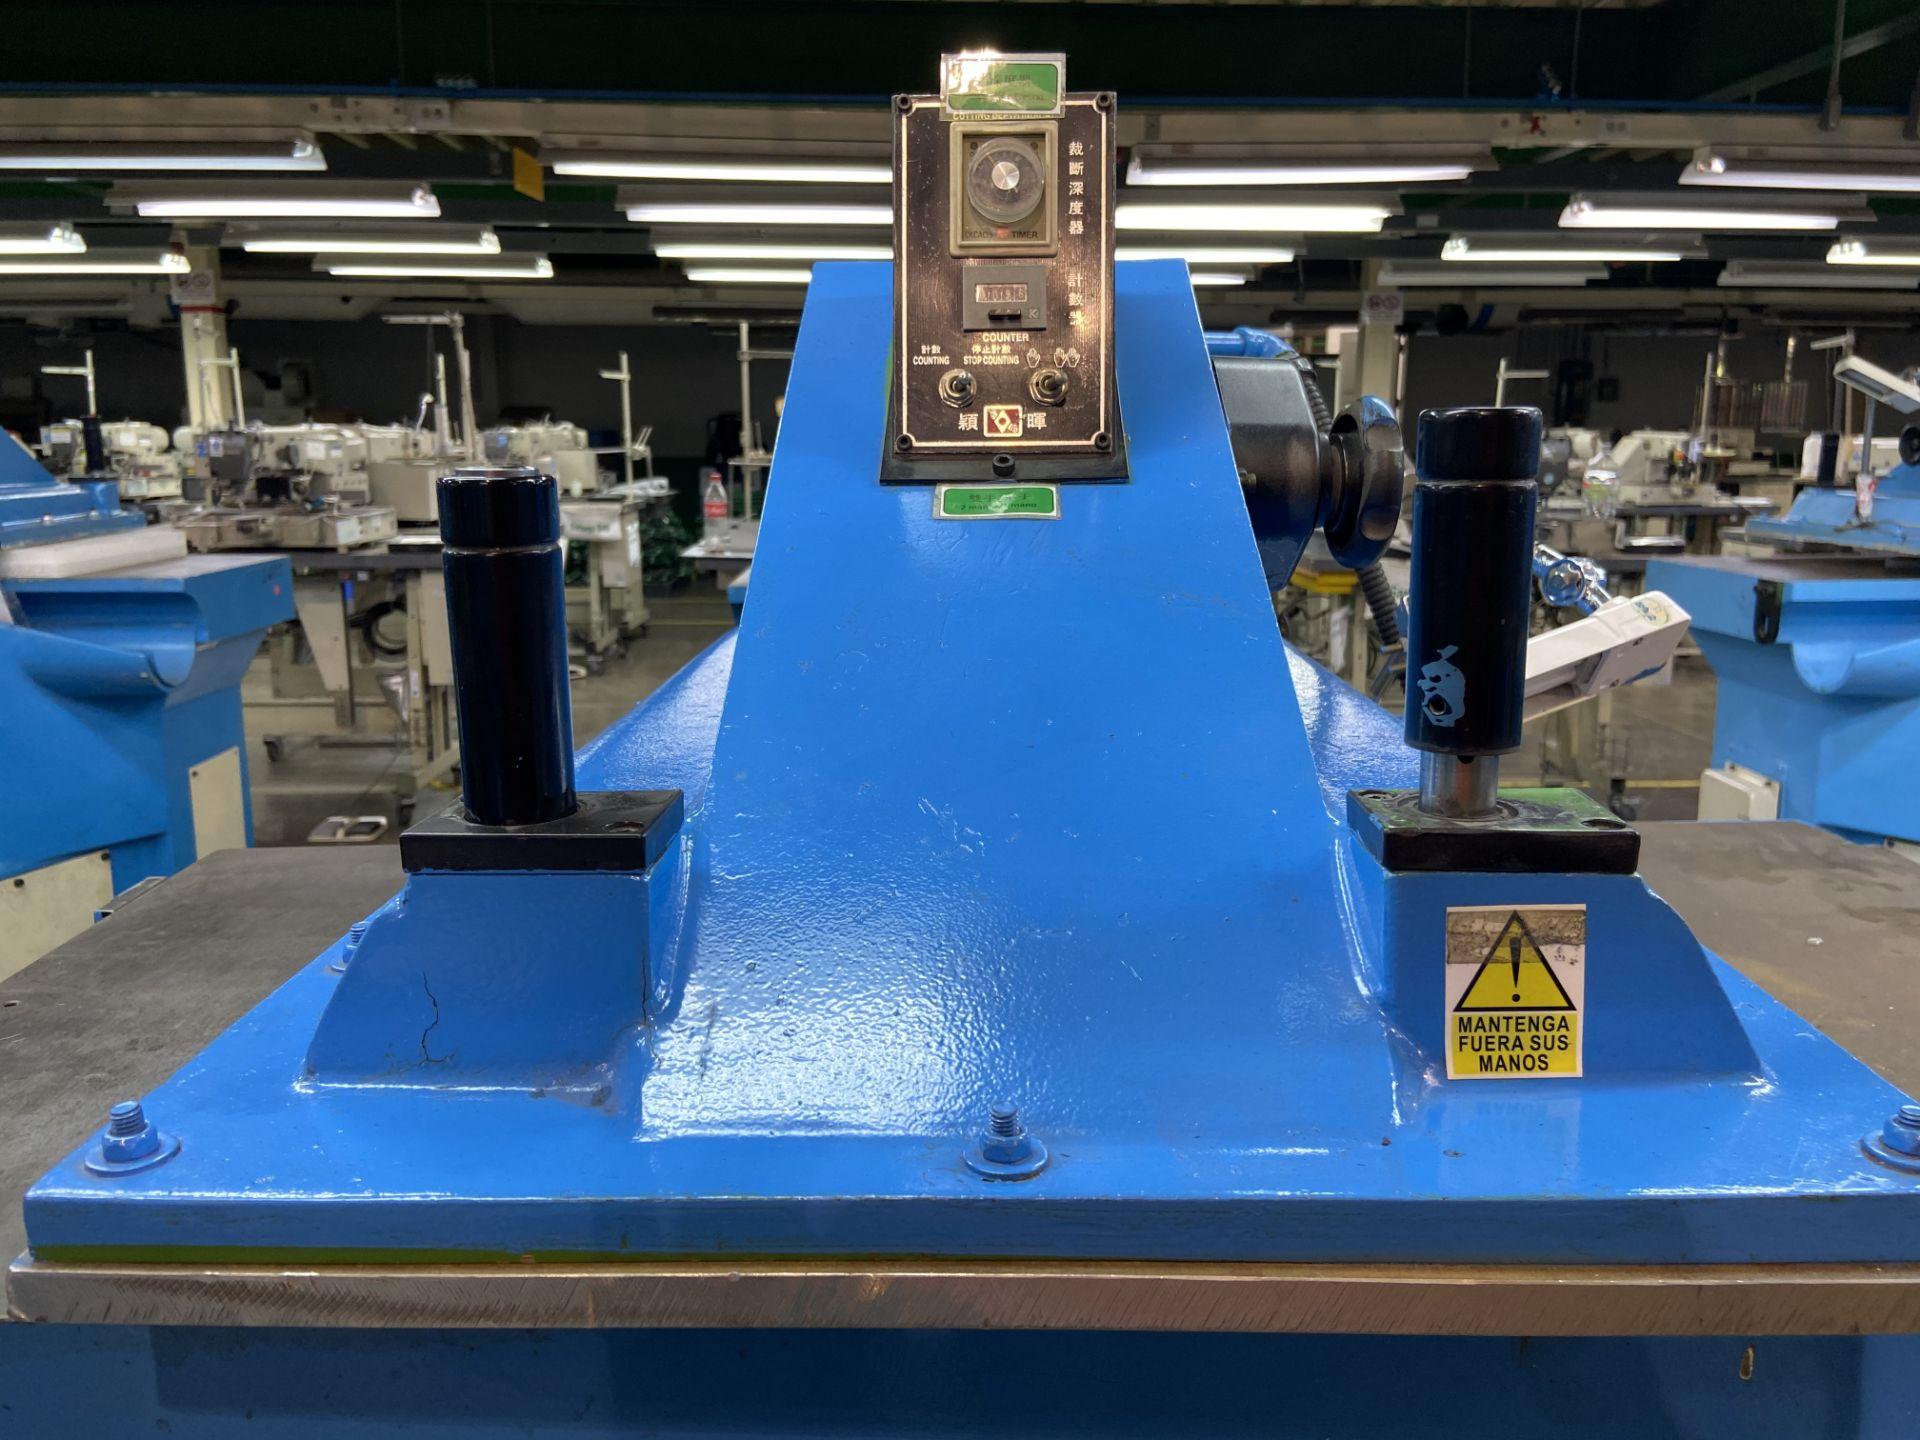 Lot 18 - (2) Prensas de corte hidráulica de brazo oscilante, marca Ying Hui Machine, Modelo: YG-520